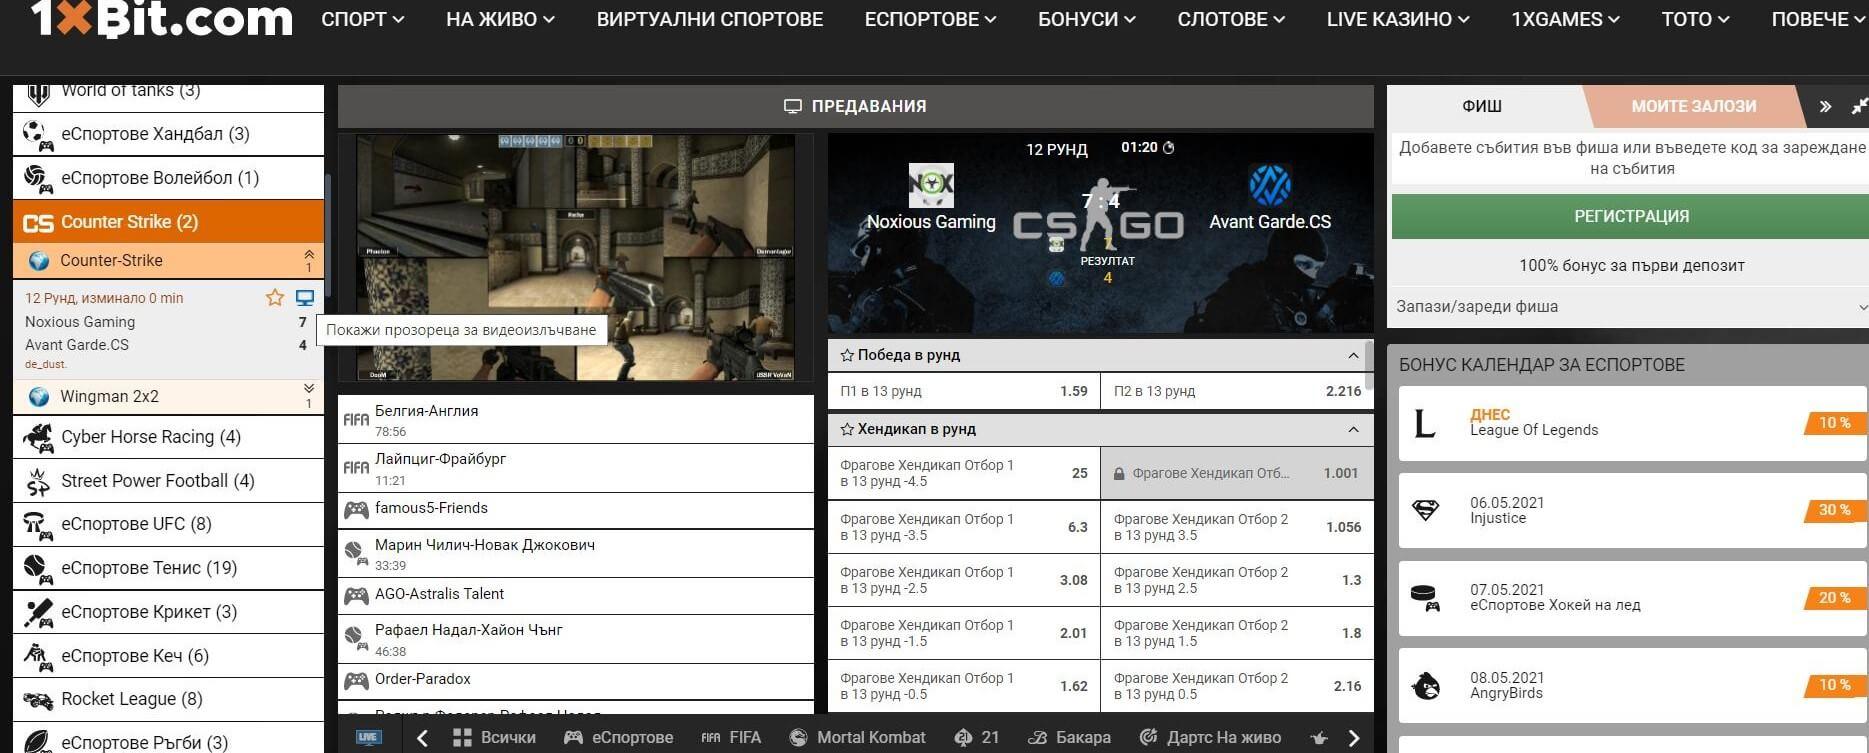 1xbit live esports-komarbet.com